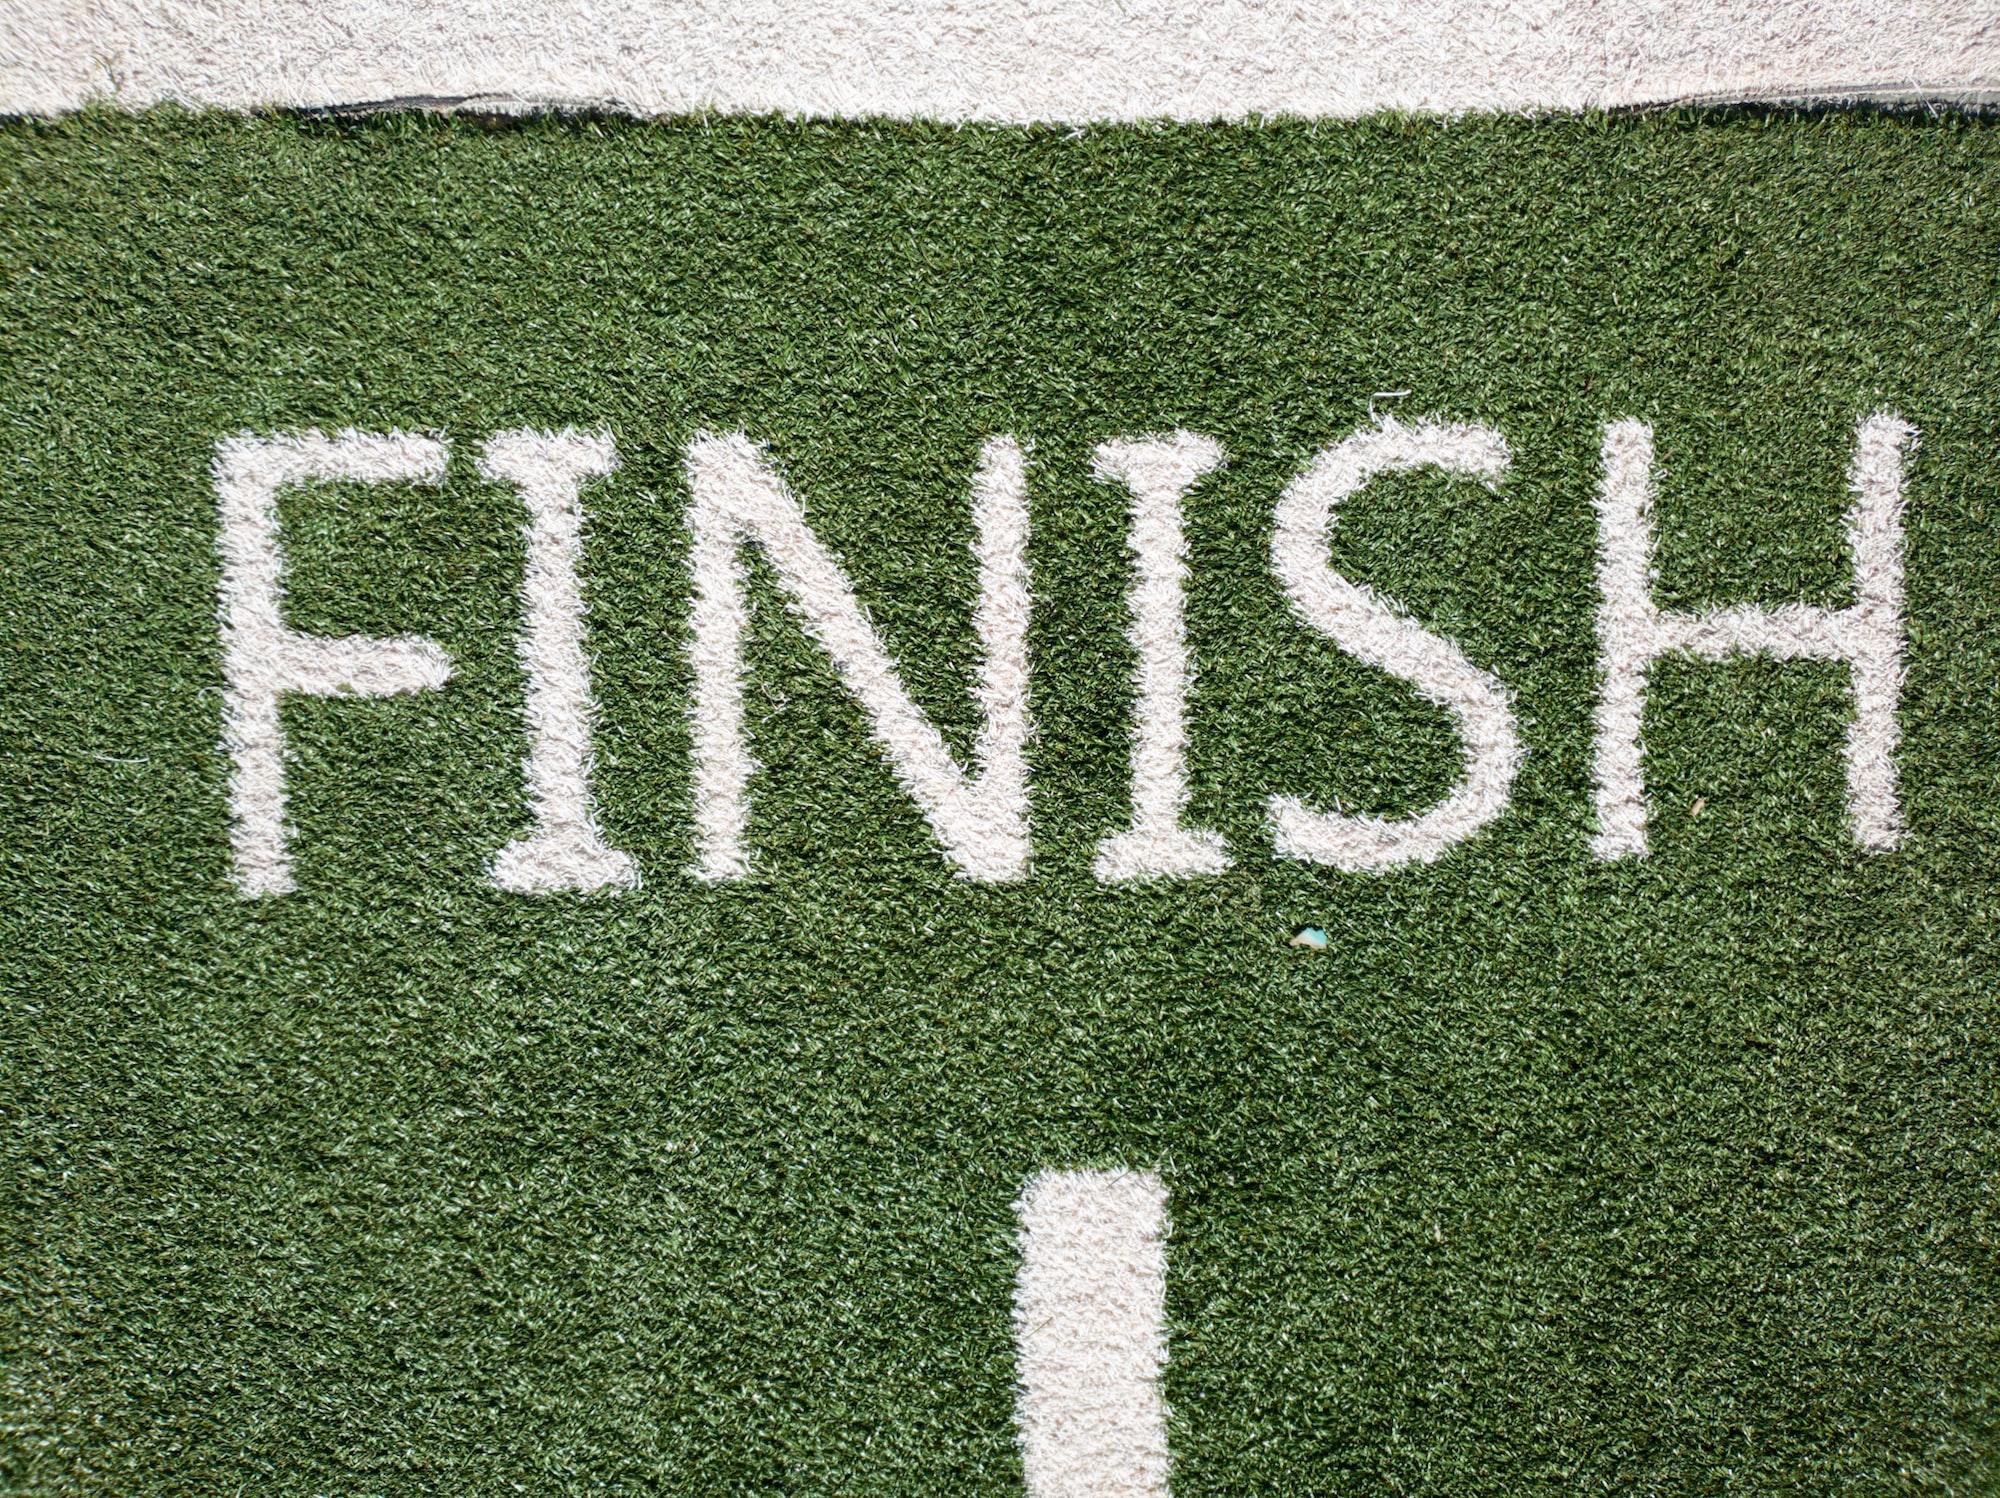 The word Finish in green turf